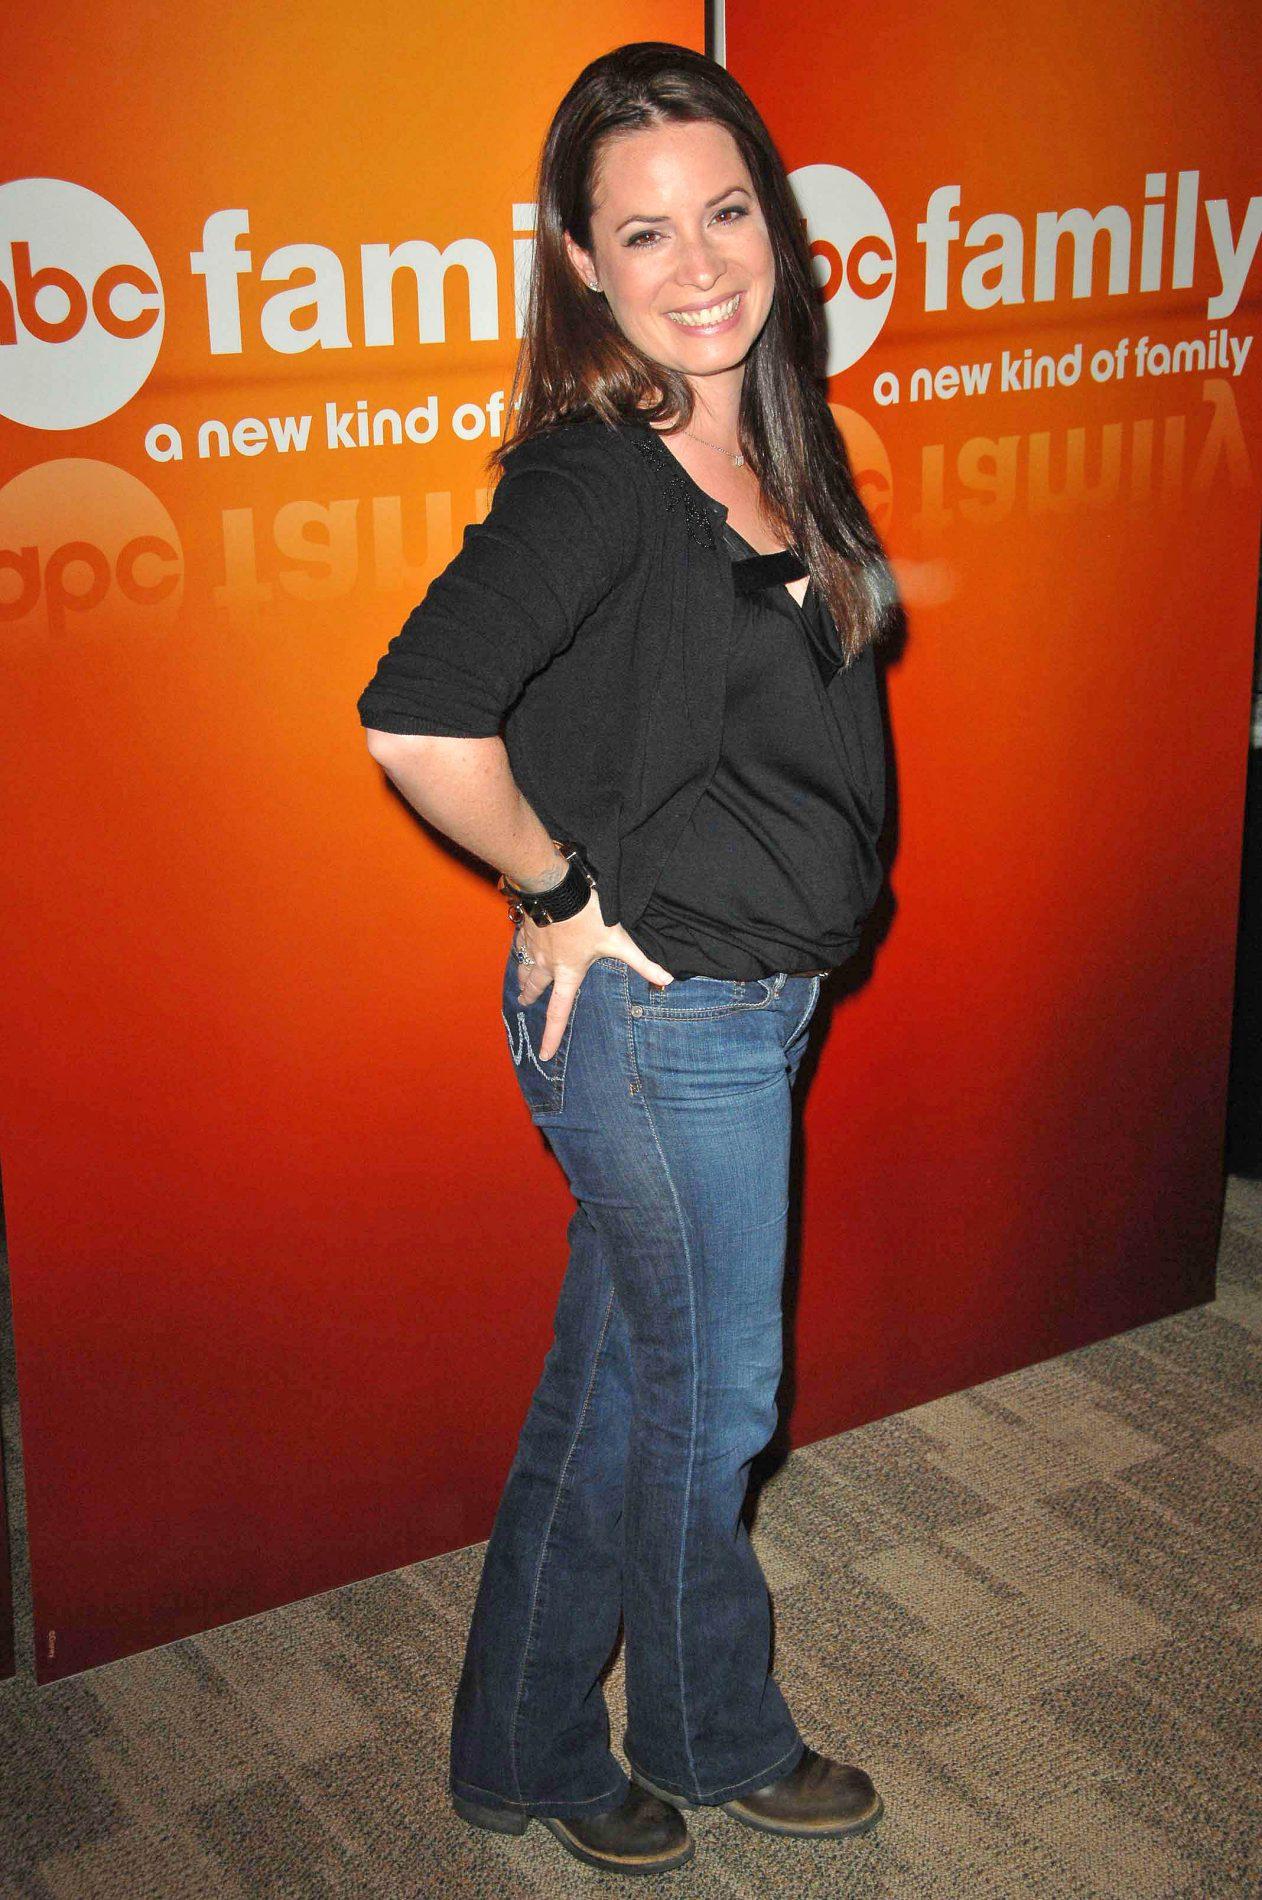 Holly Marie Combs star con qualche kg in più